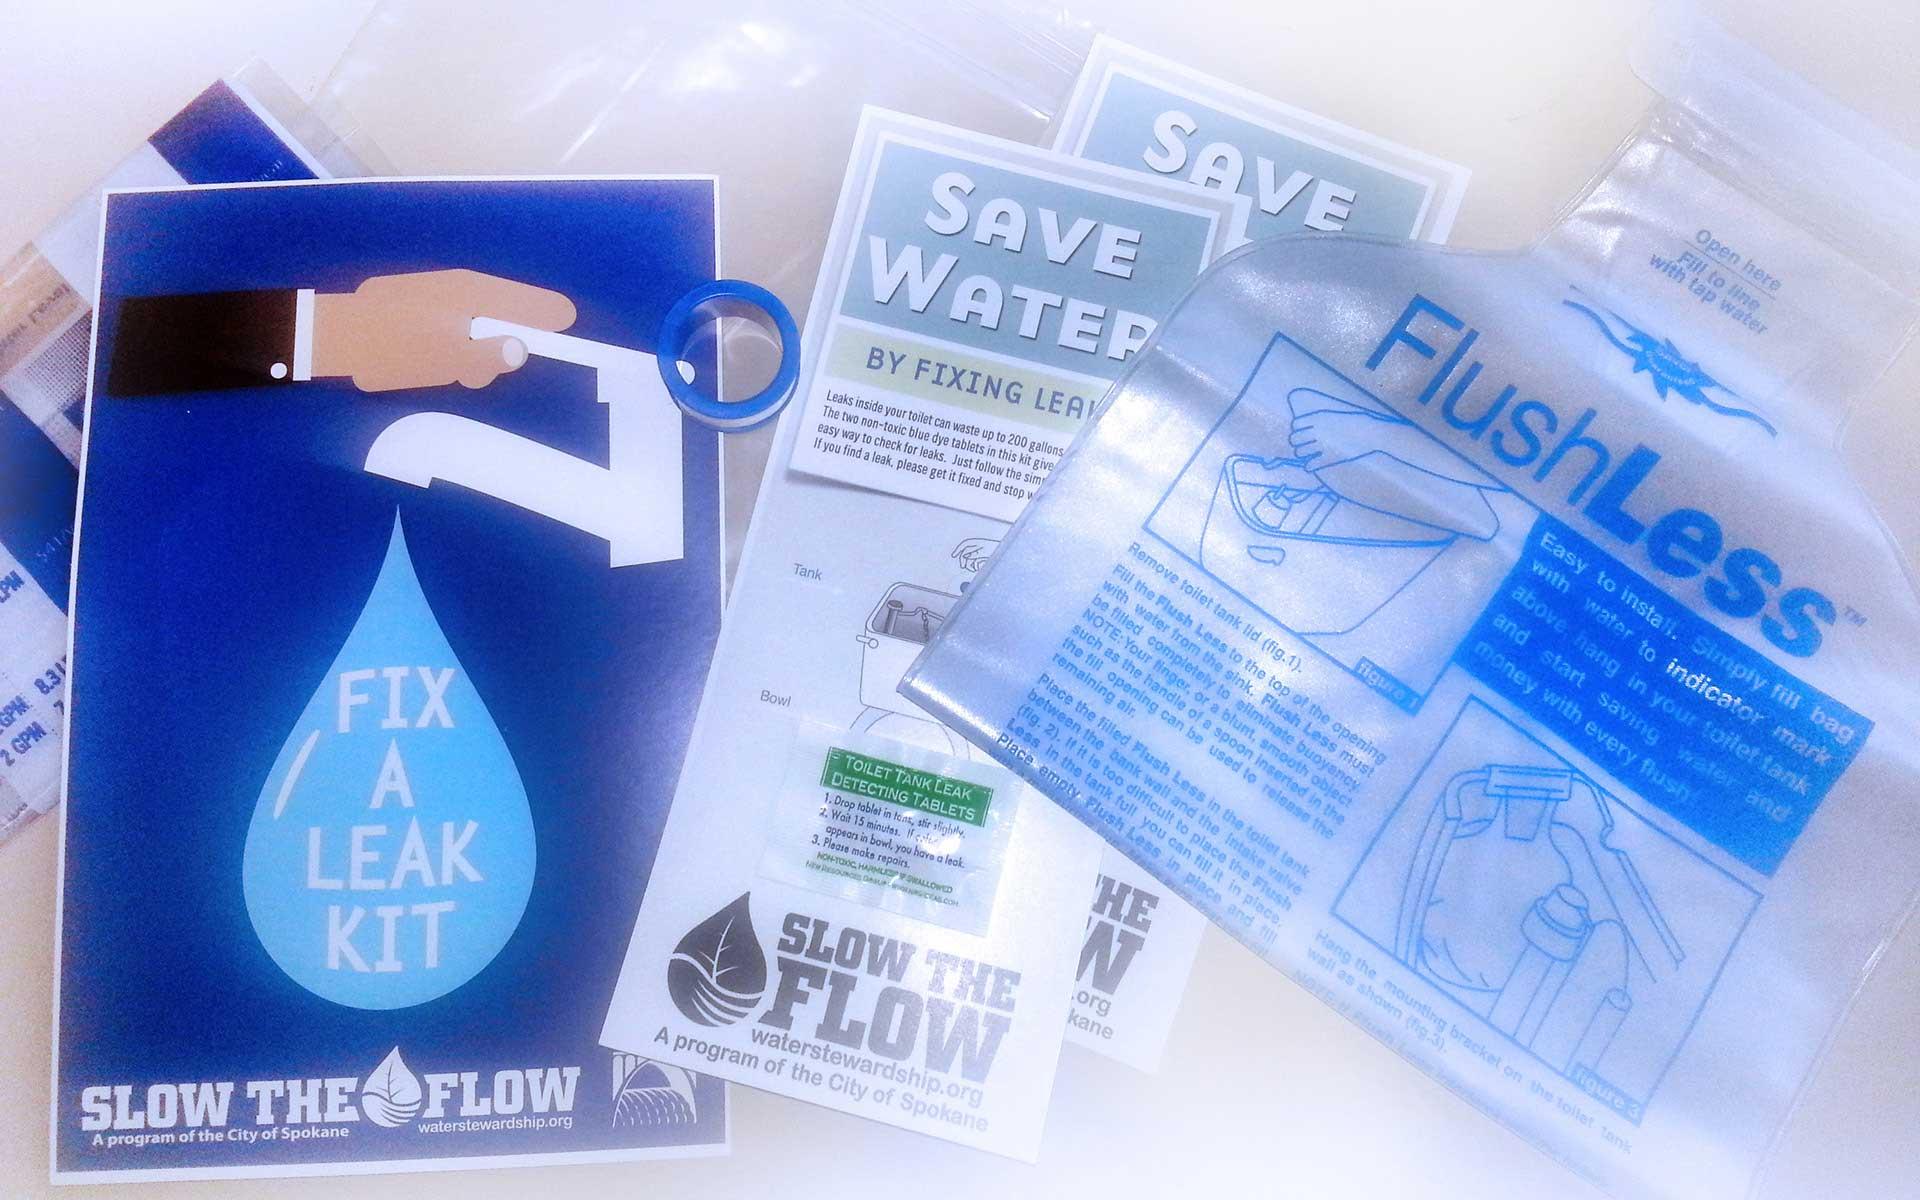 Fix a Leak to Save Water  Money  City of Spokane